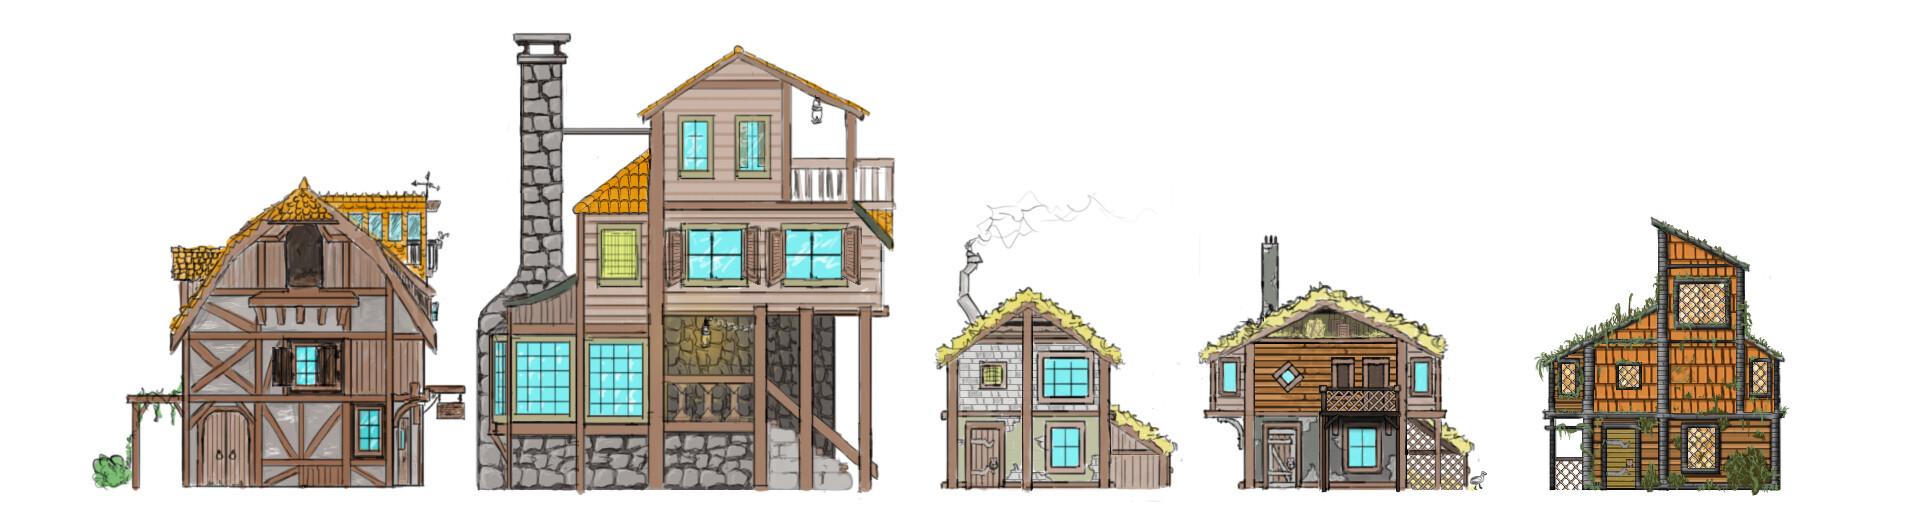 Alexander laheij house designs